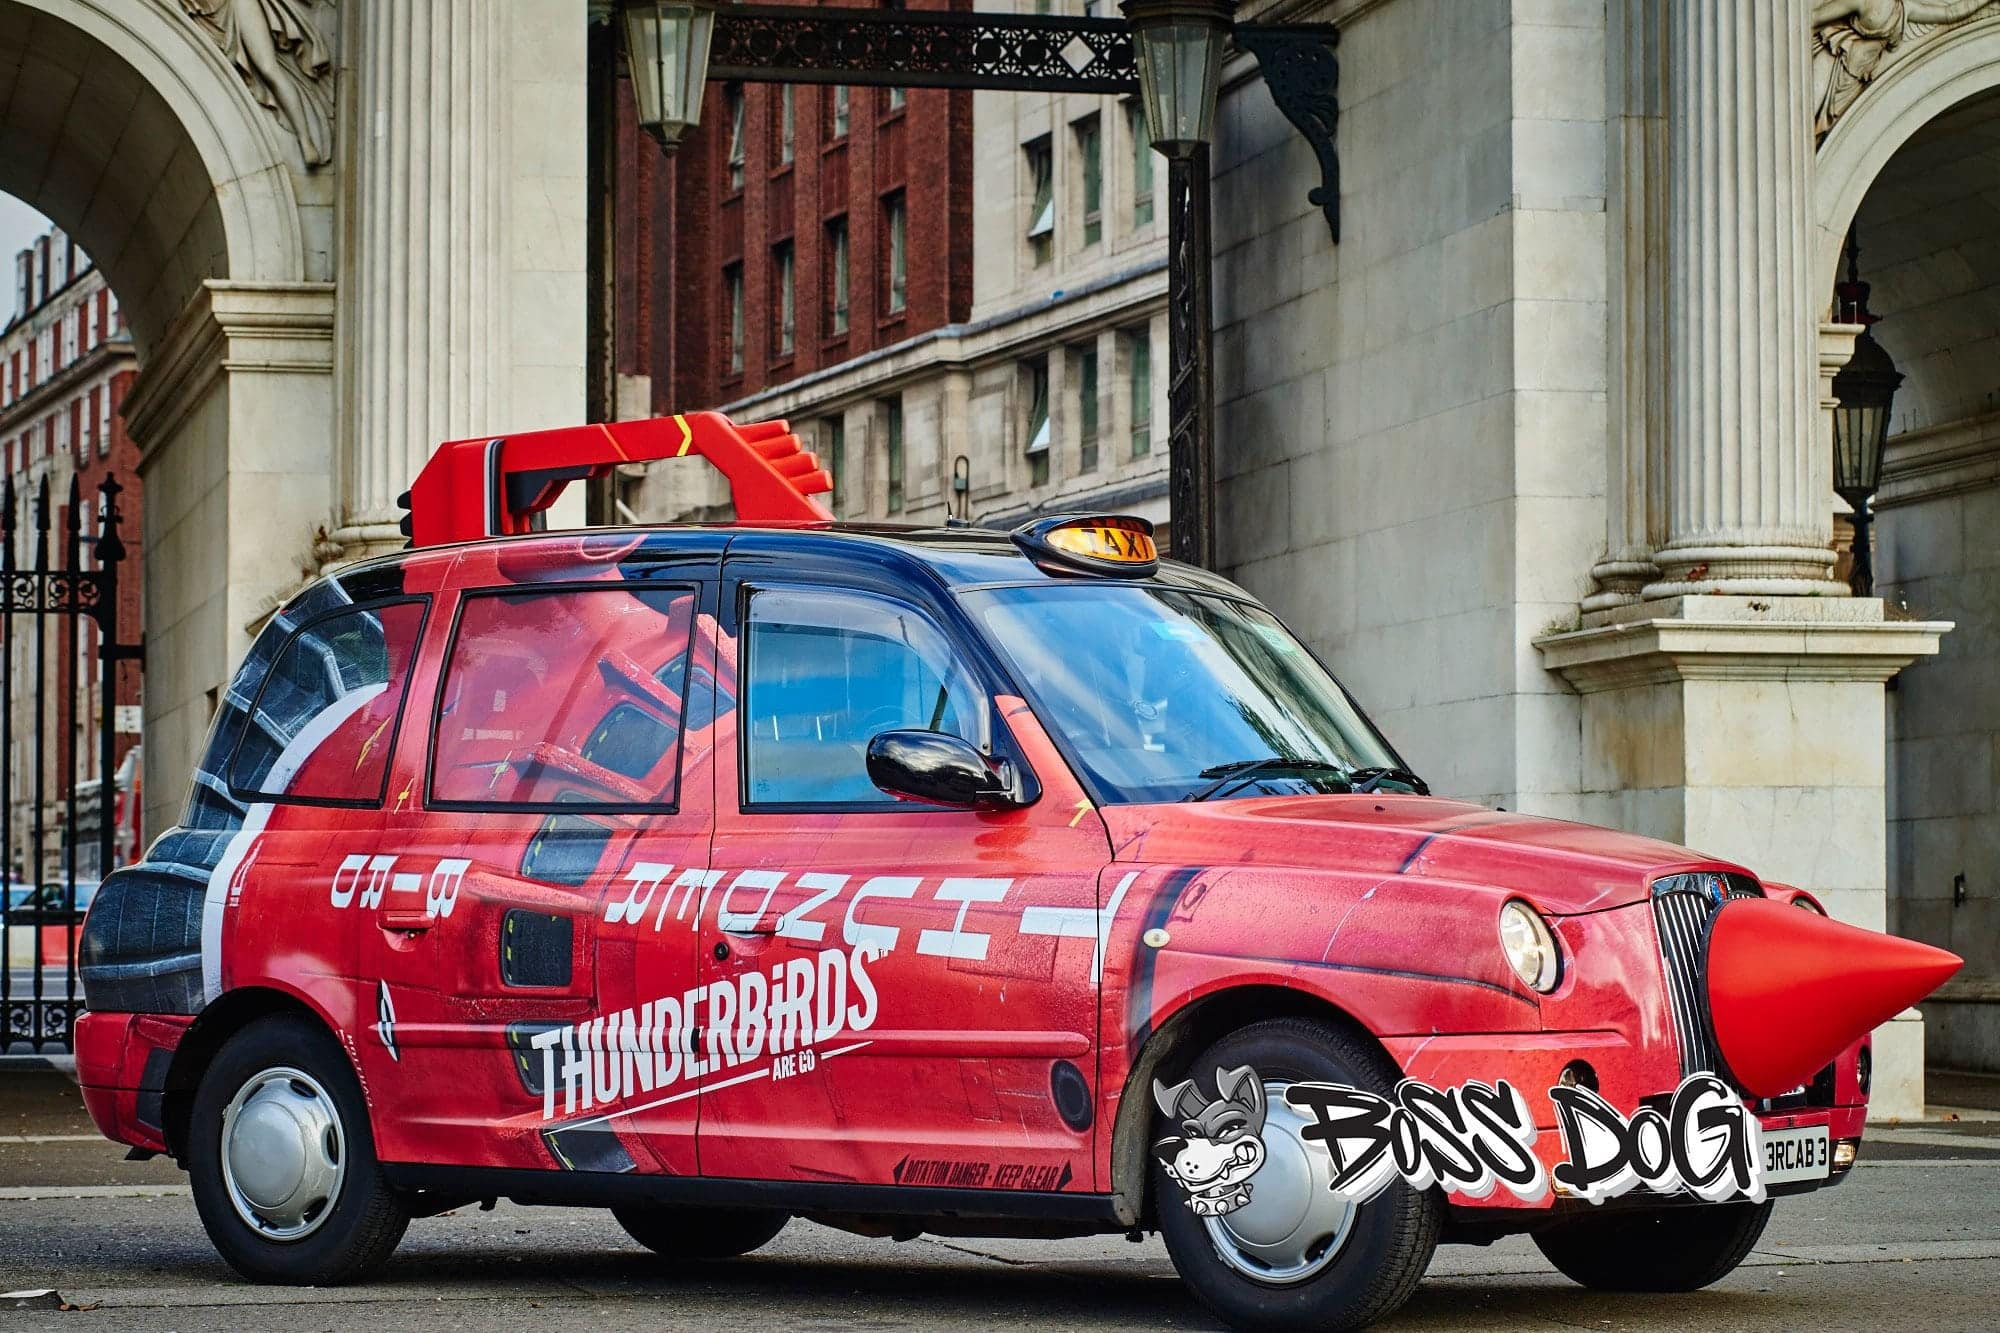 Thundercabs full wrap digital print taxi